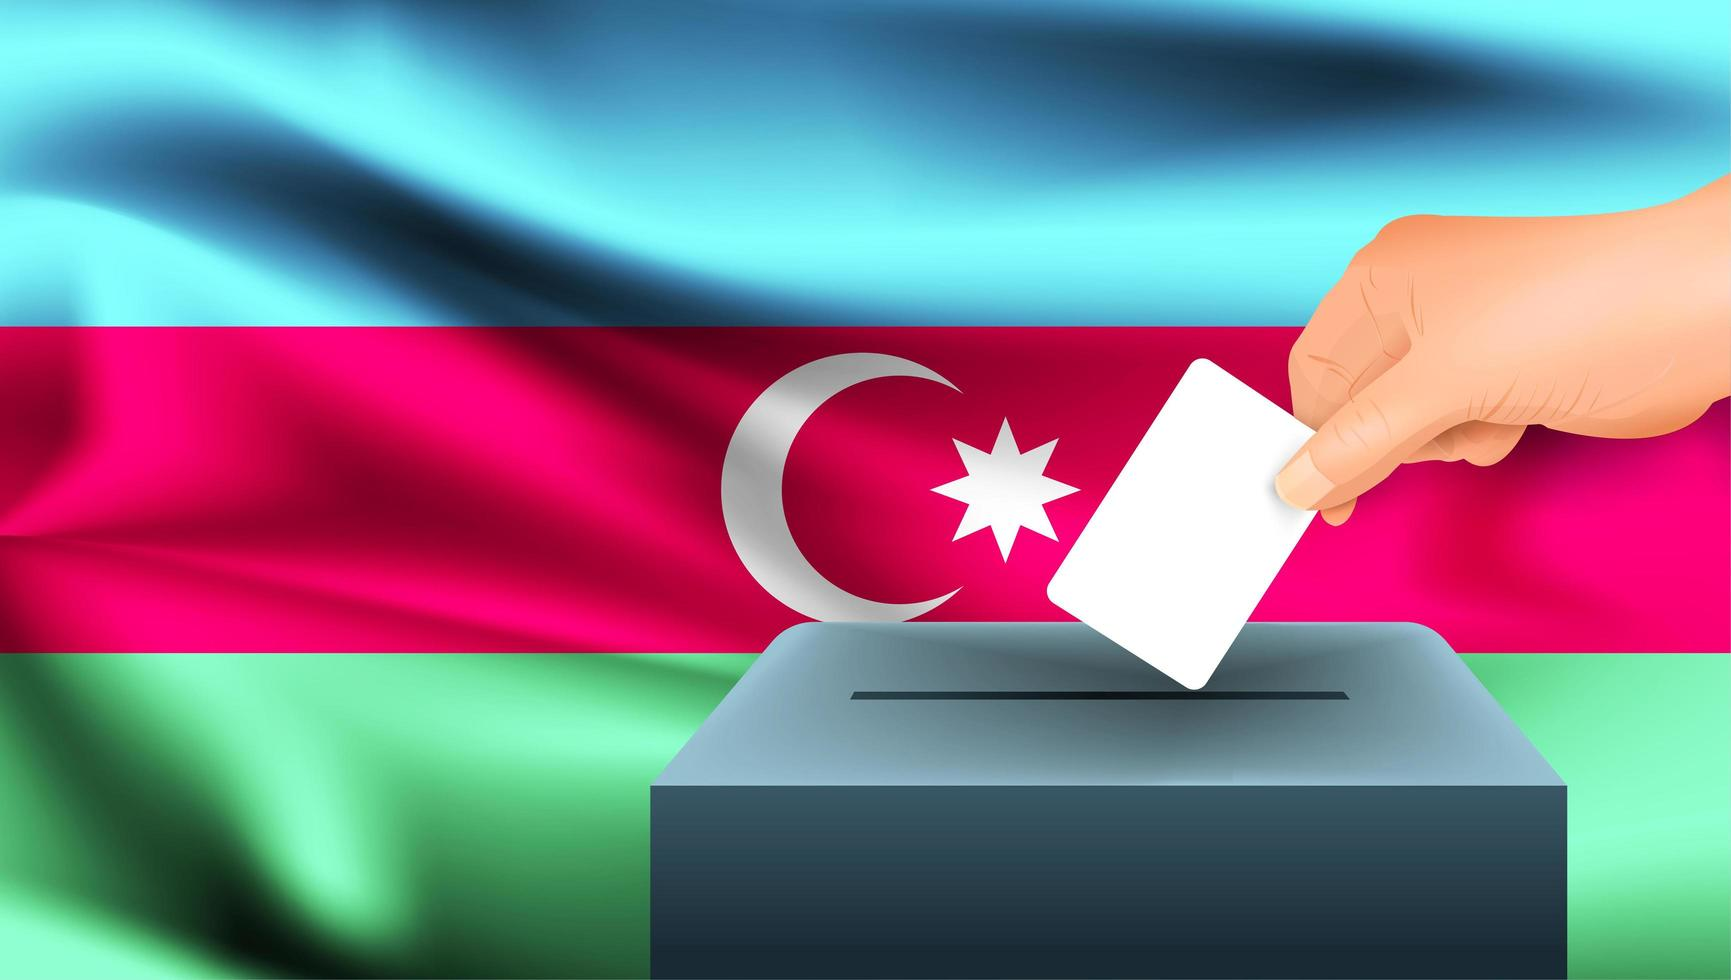 Hand putting ballot into box with Azerbaijan flag vector